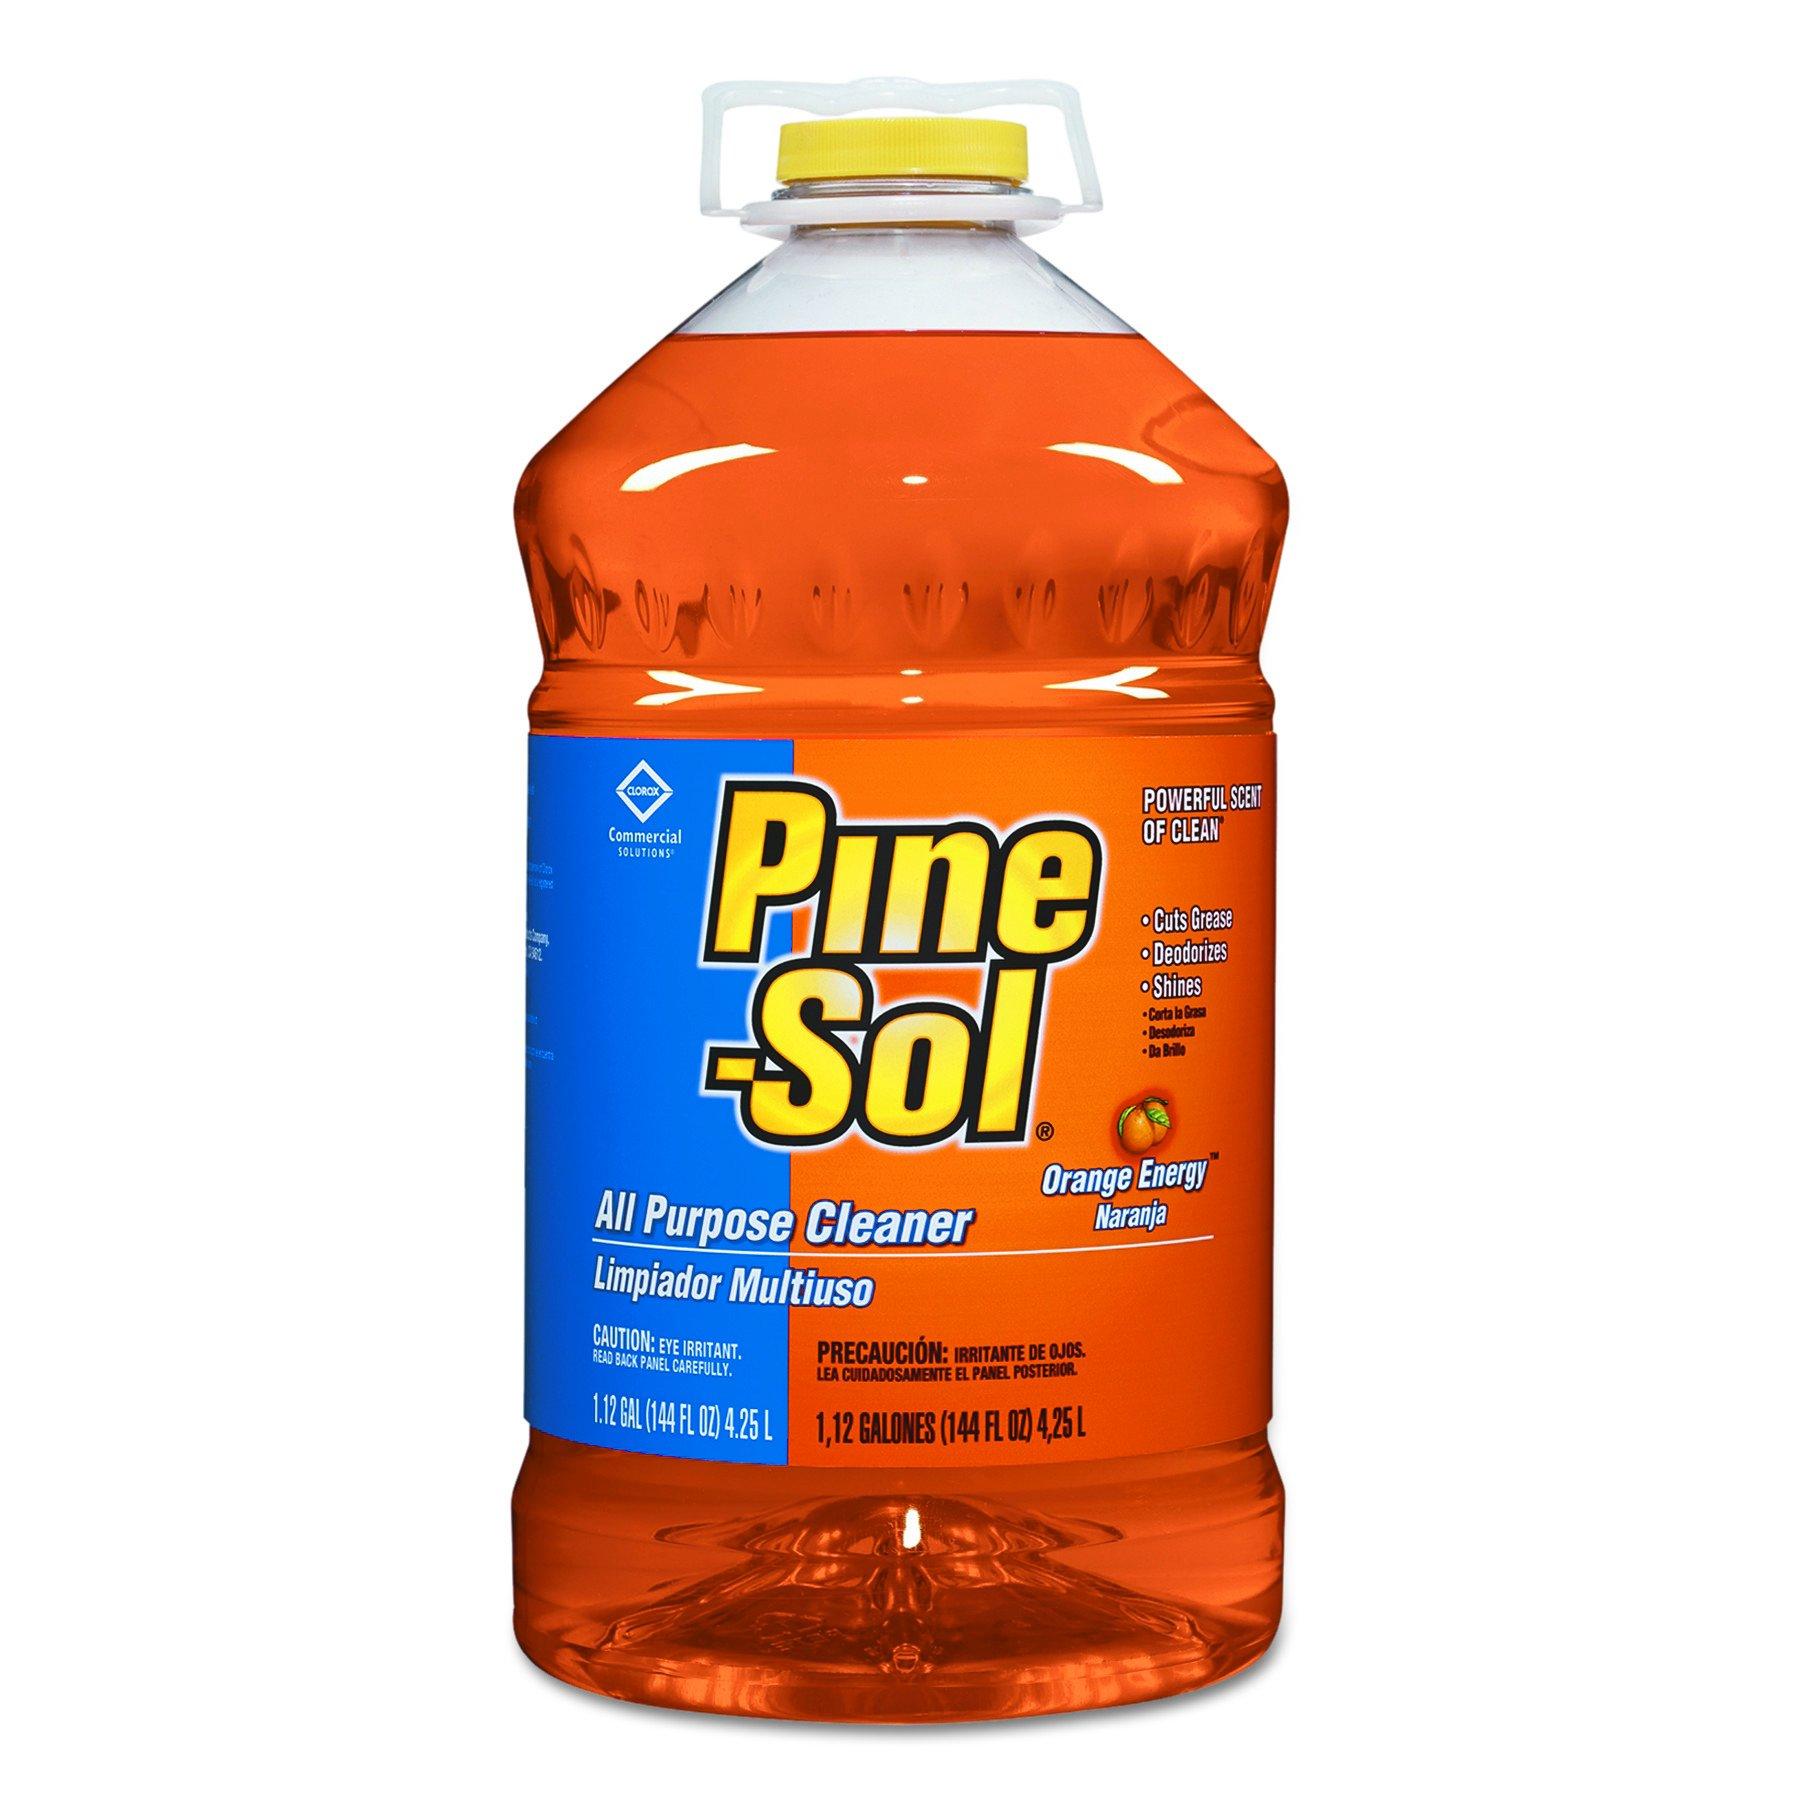 Pine-Sol 41772CT All-Purpose Cleaner, Orange, 144oz Bottle (Case of 3)